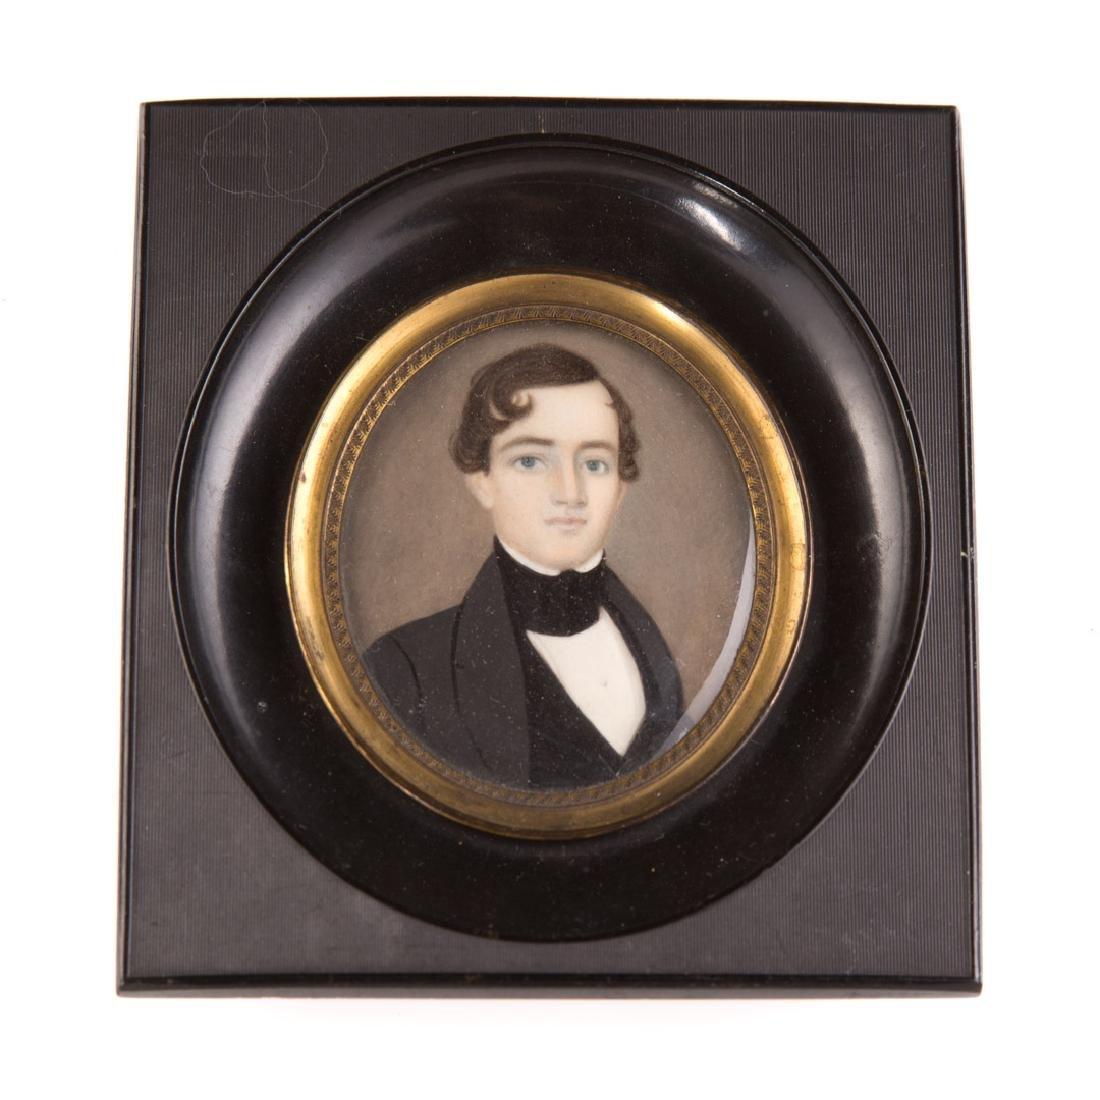 American School, 19th century portrait miniature